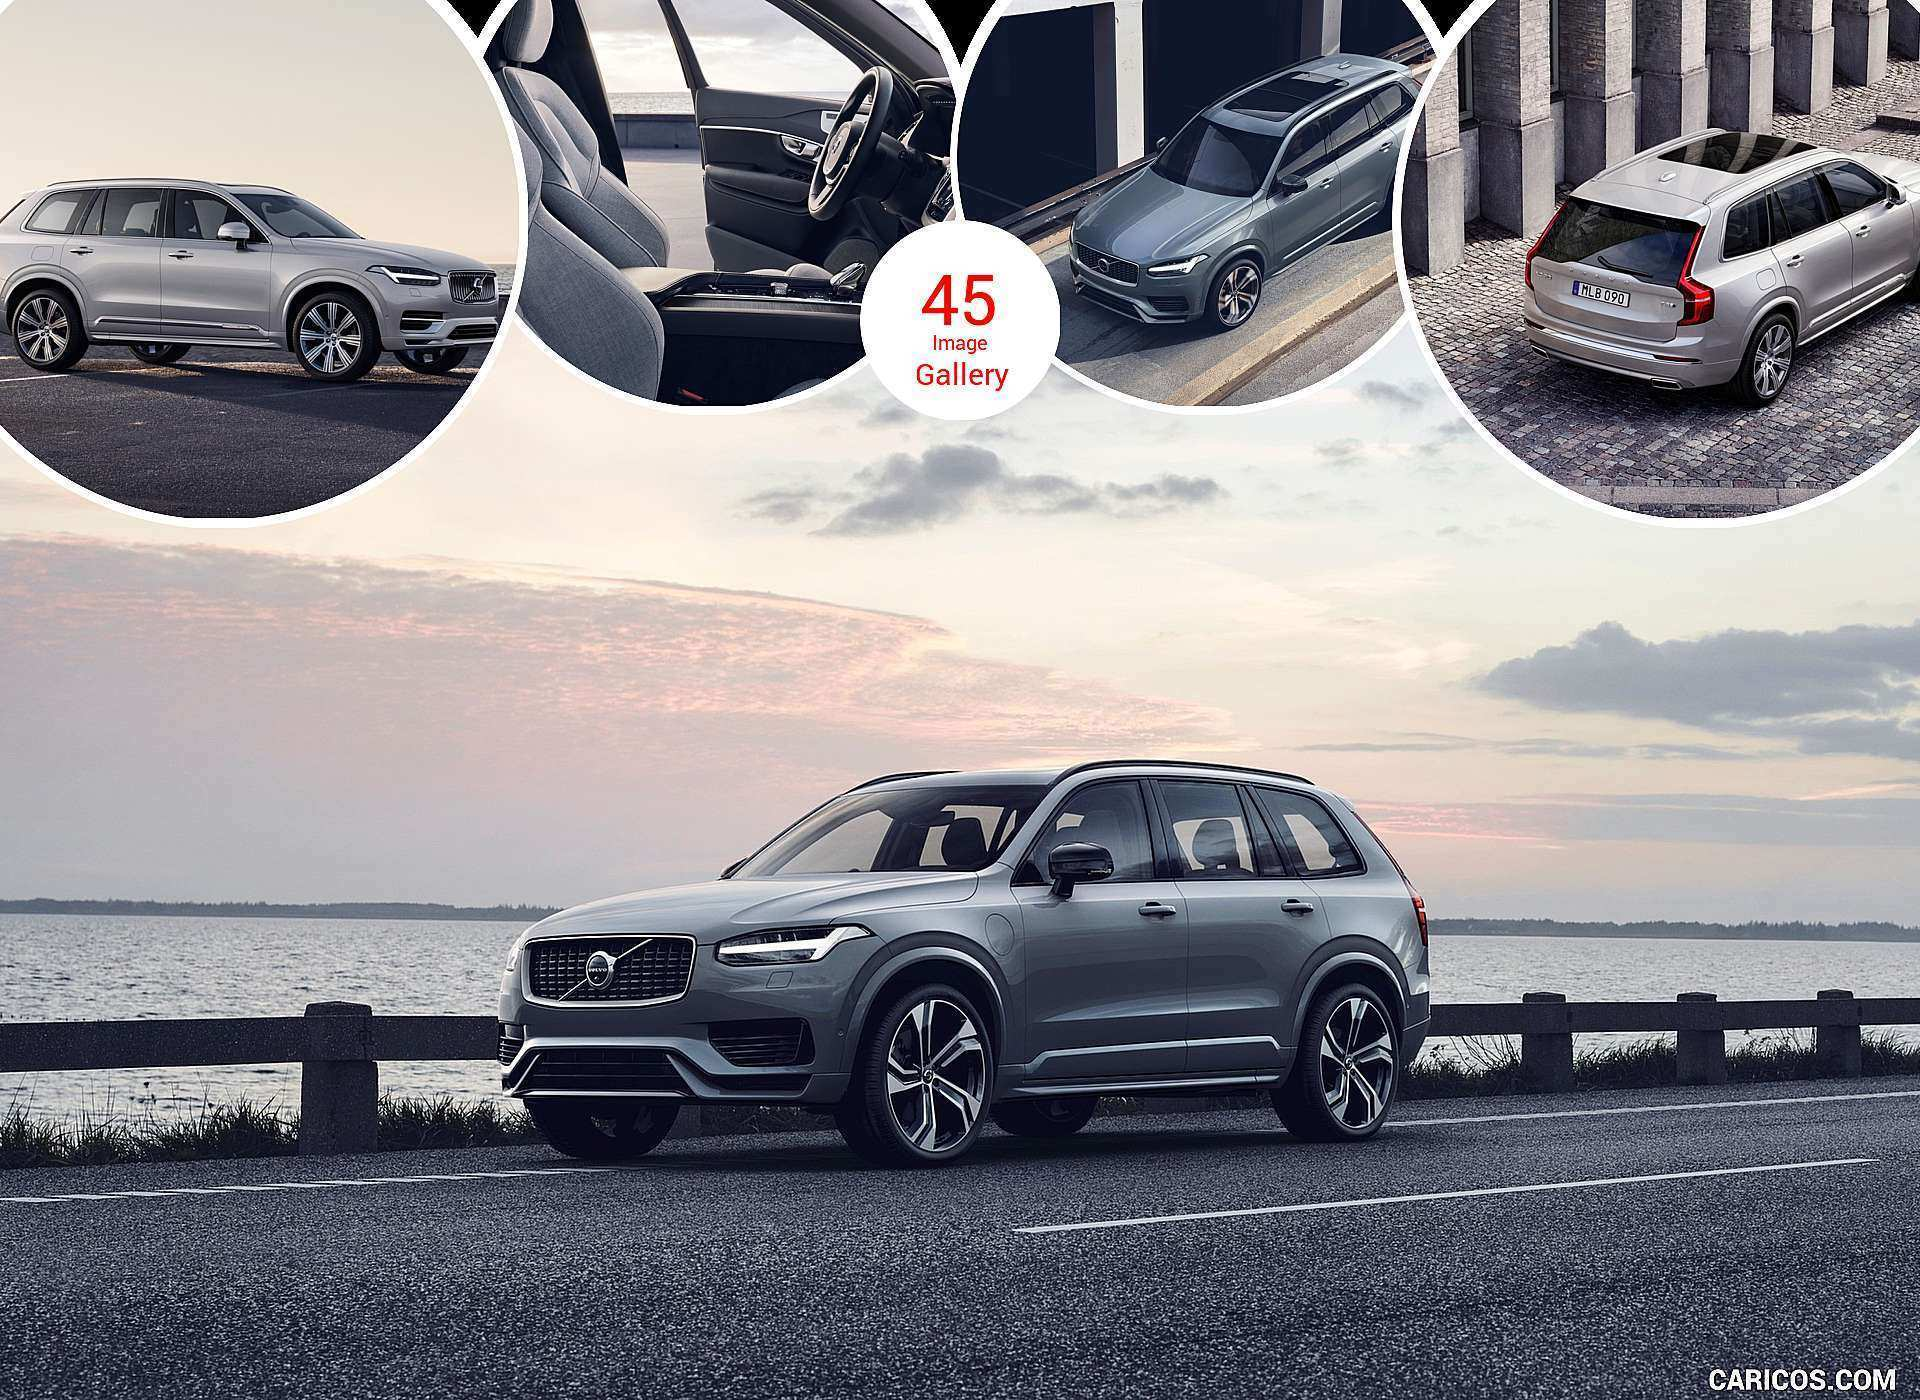 38 Great 2020 Volvo XC90 Price for 2020 Volvo XC90